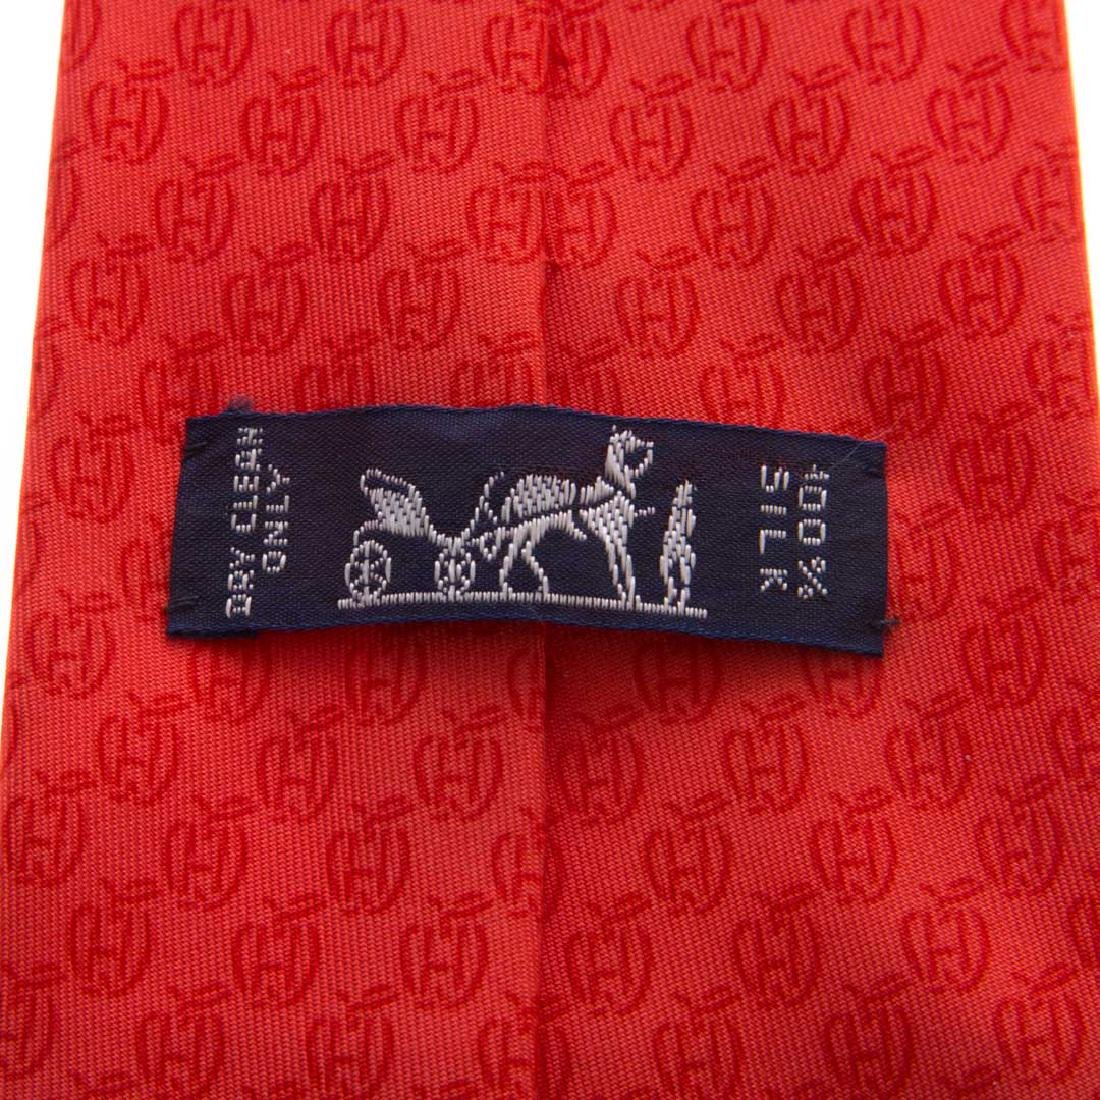 Hermès Apple Print Tie & Hounds Tooth Print Tie - 4